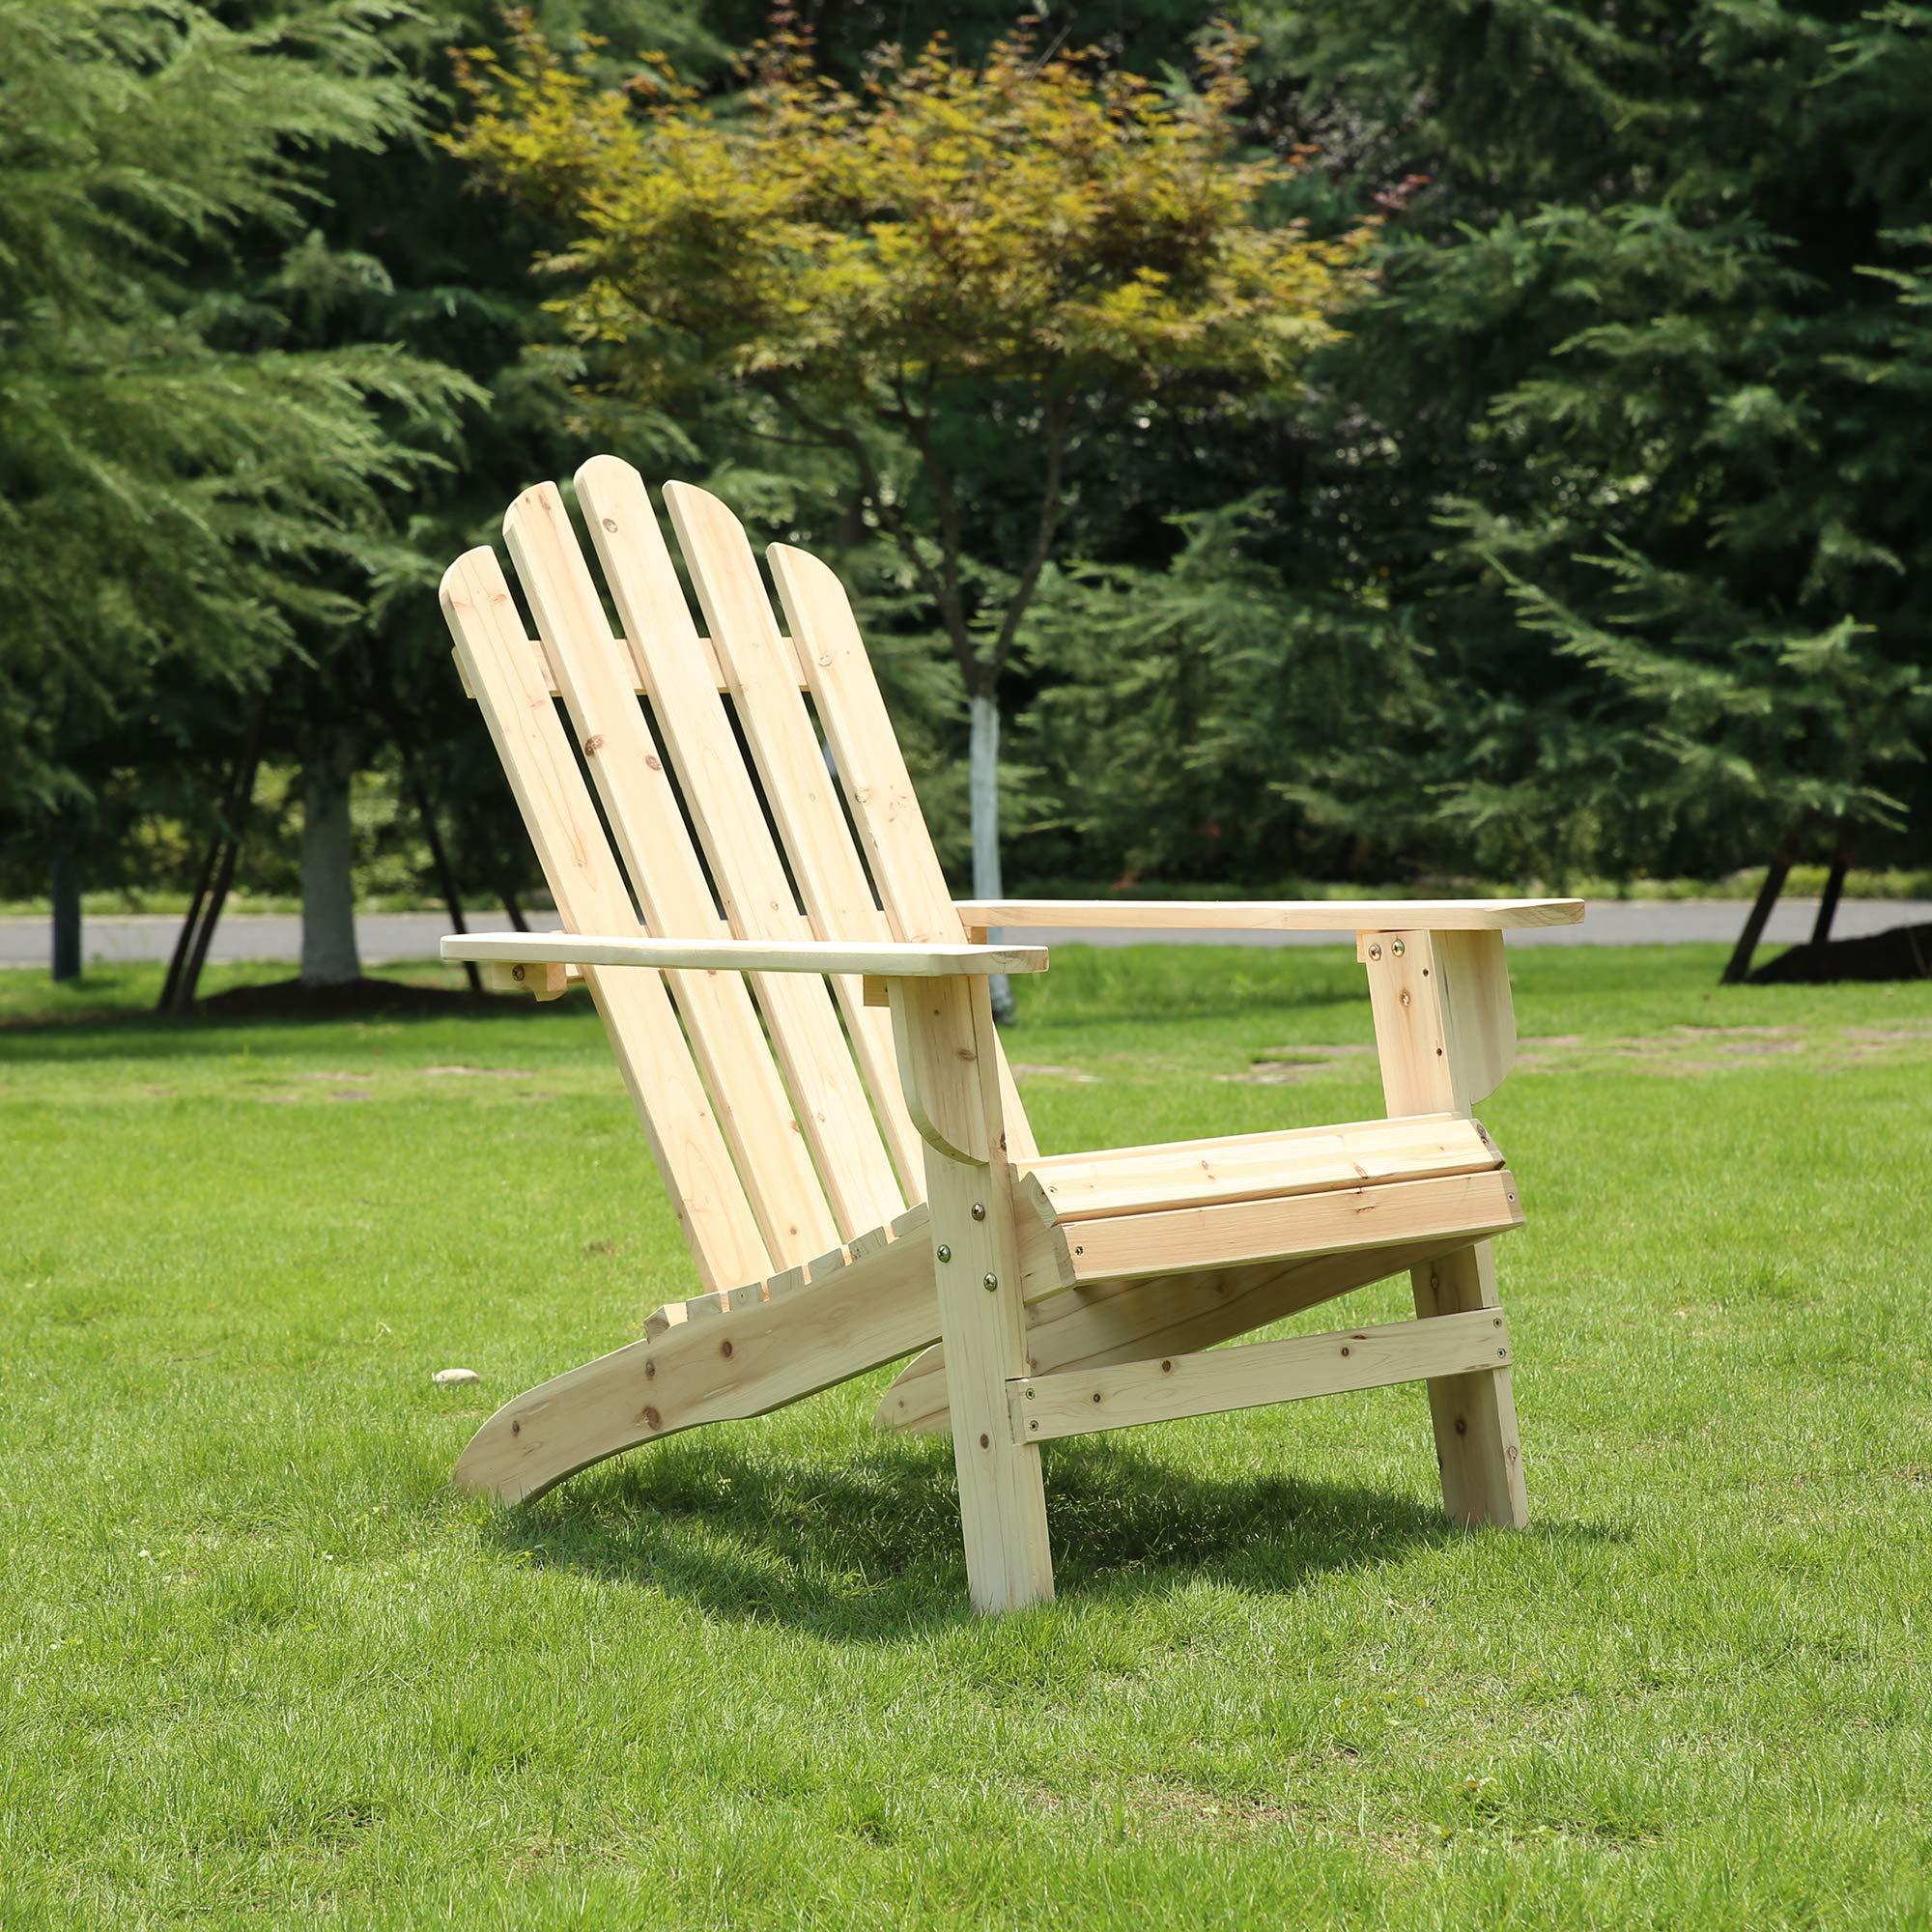 Azbro SongSen Outdoor Wooden Fashion Adirondack Chair/Muskoka Chairs Patio Deck Garden Furniture,Natural by Azbro